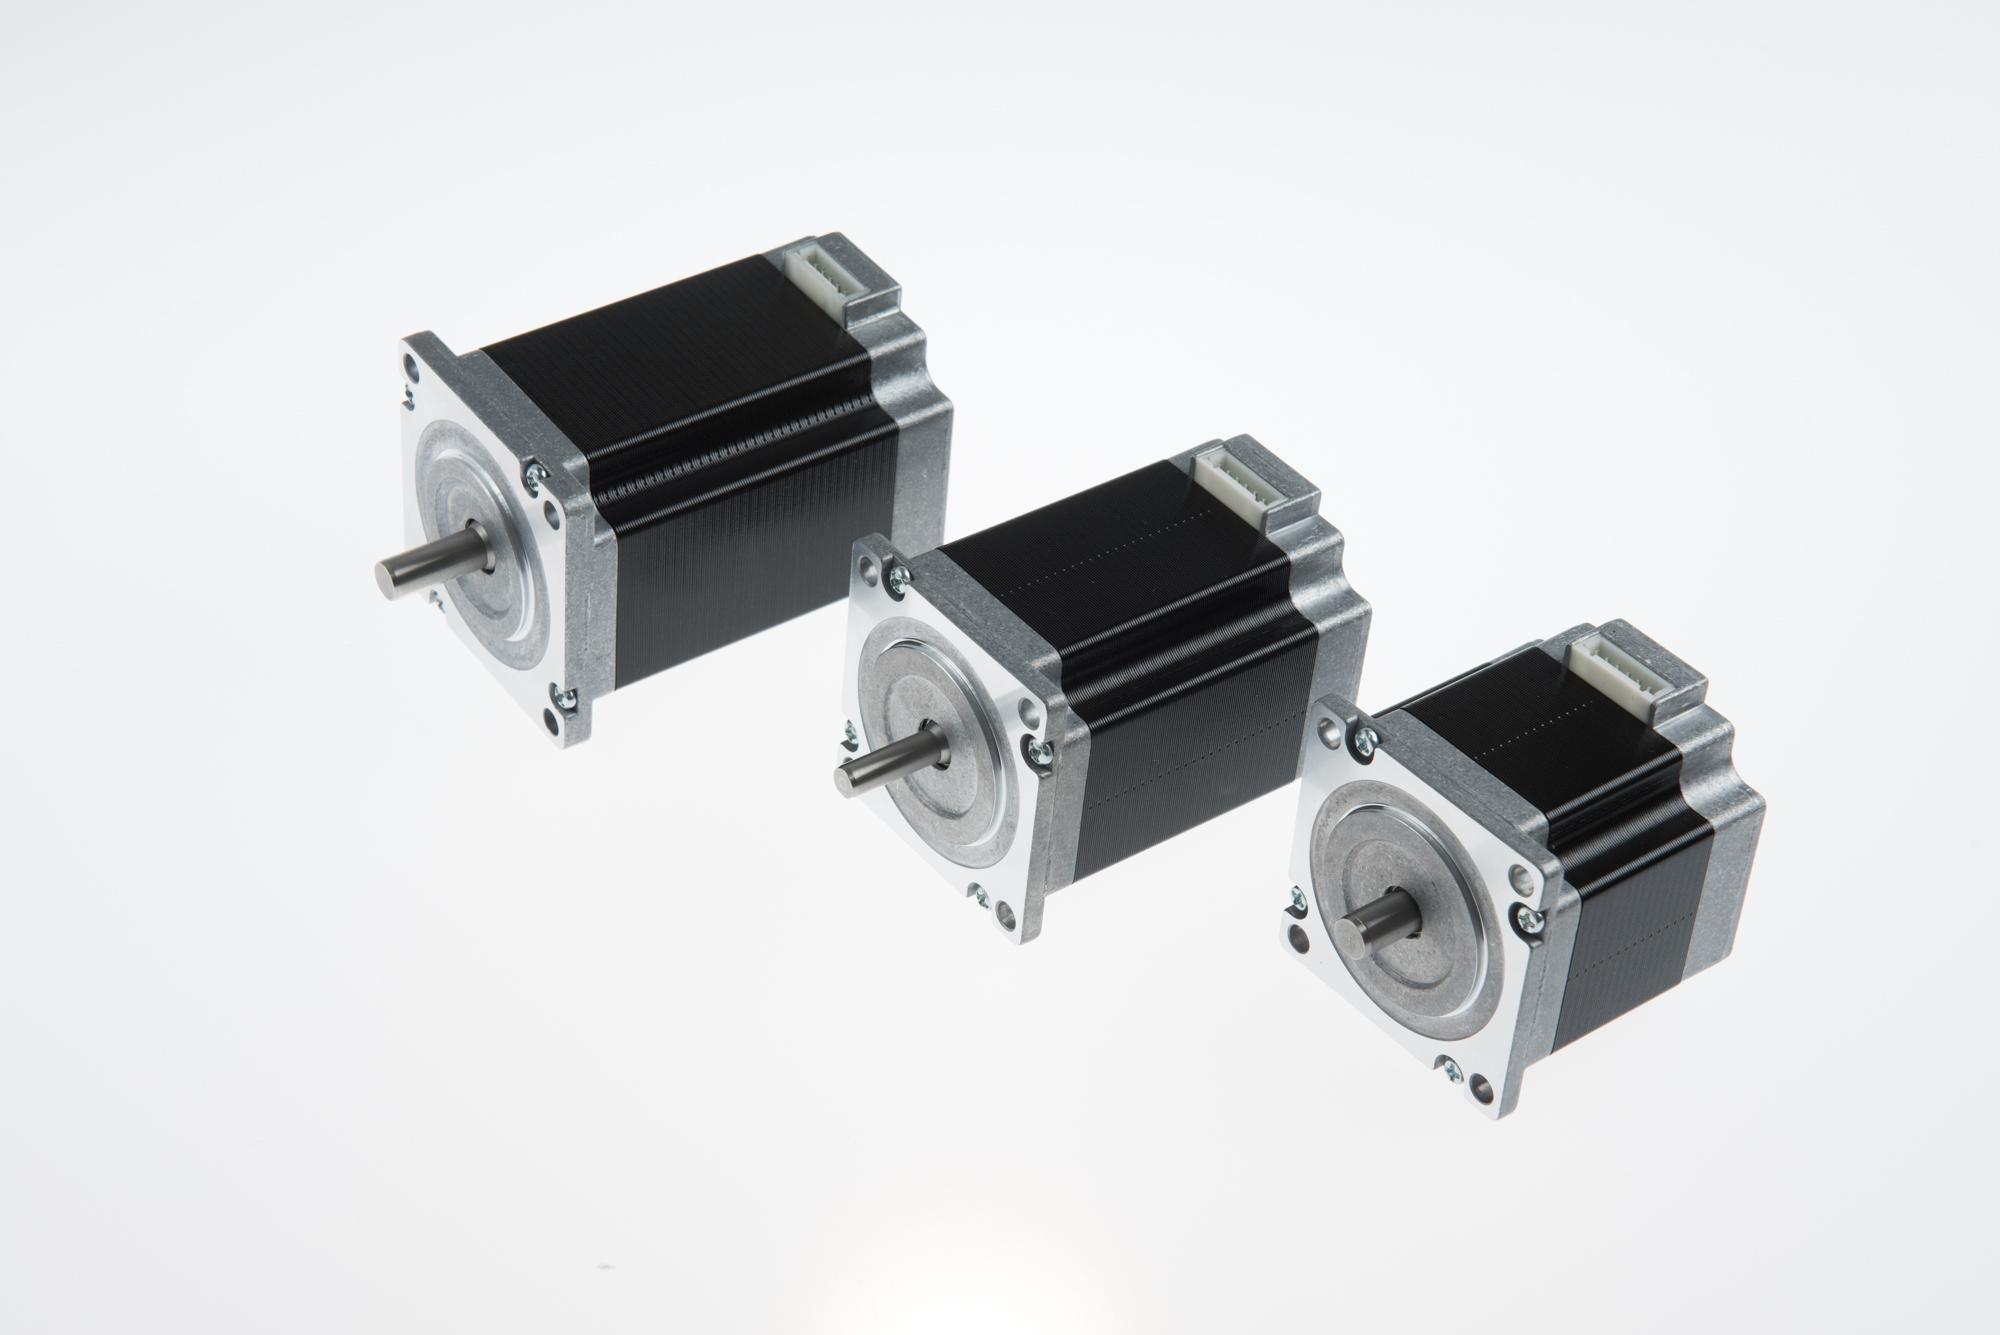 ODM Manufacturer Bag Making Machine Motor Driver - NEMA 23 step angel 0.9 degree connector type hybrid stepping motor  (76mm 1.8N.m) – PROSTEPPER